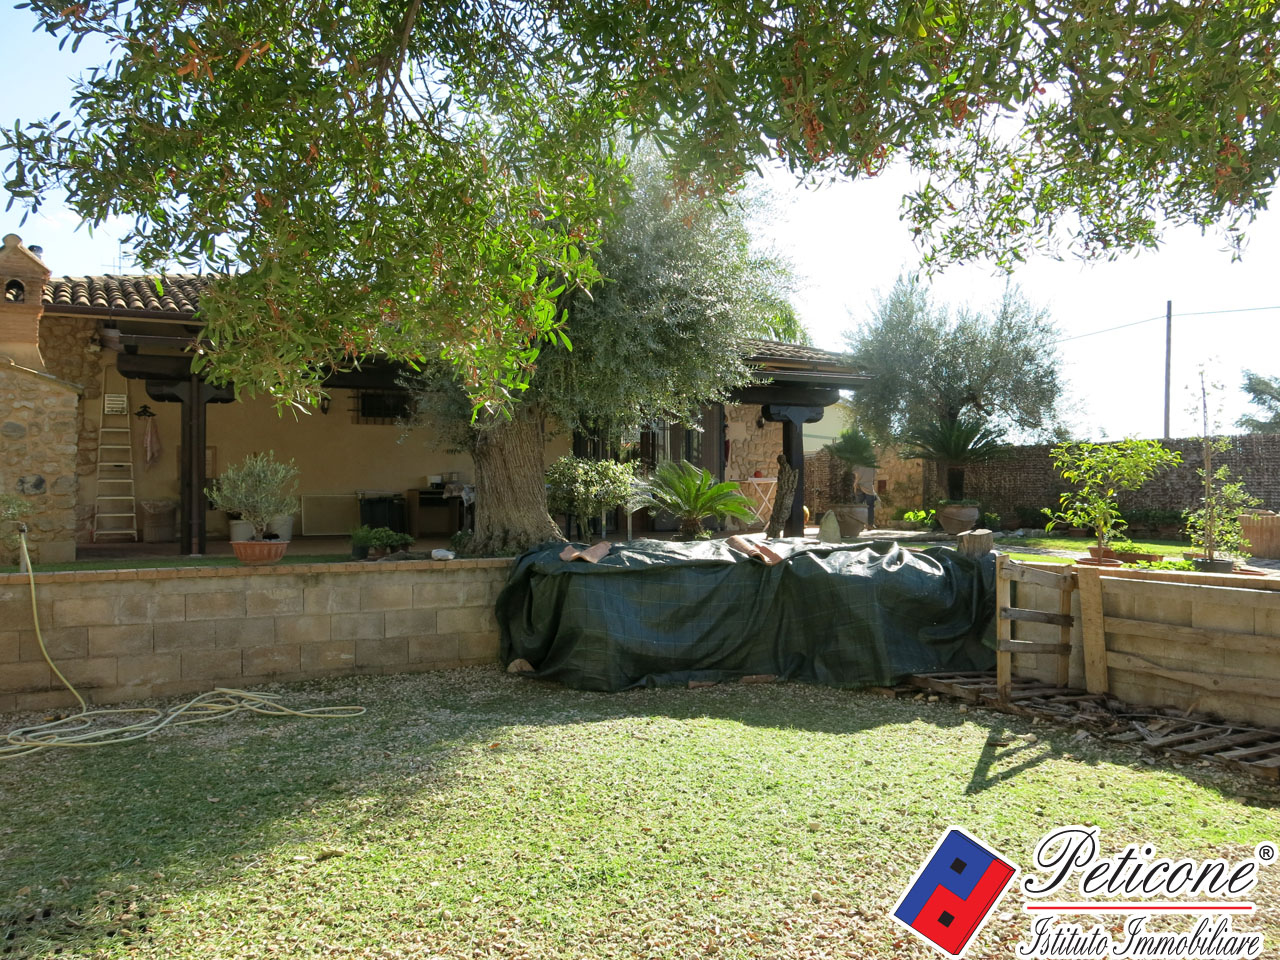 Villa in Vendita a Fondi: 3 locali, 107 mq - Foto 22